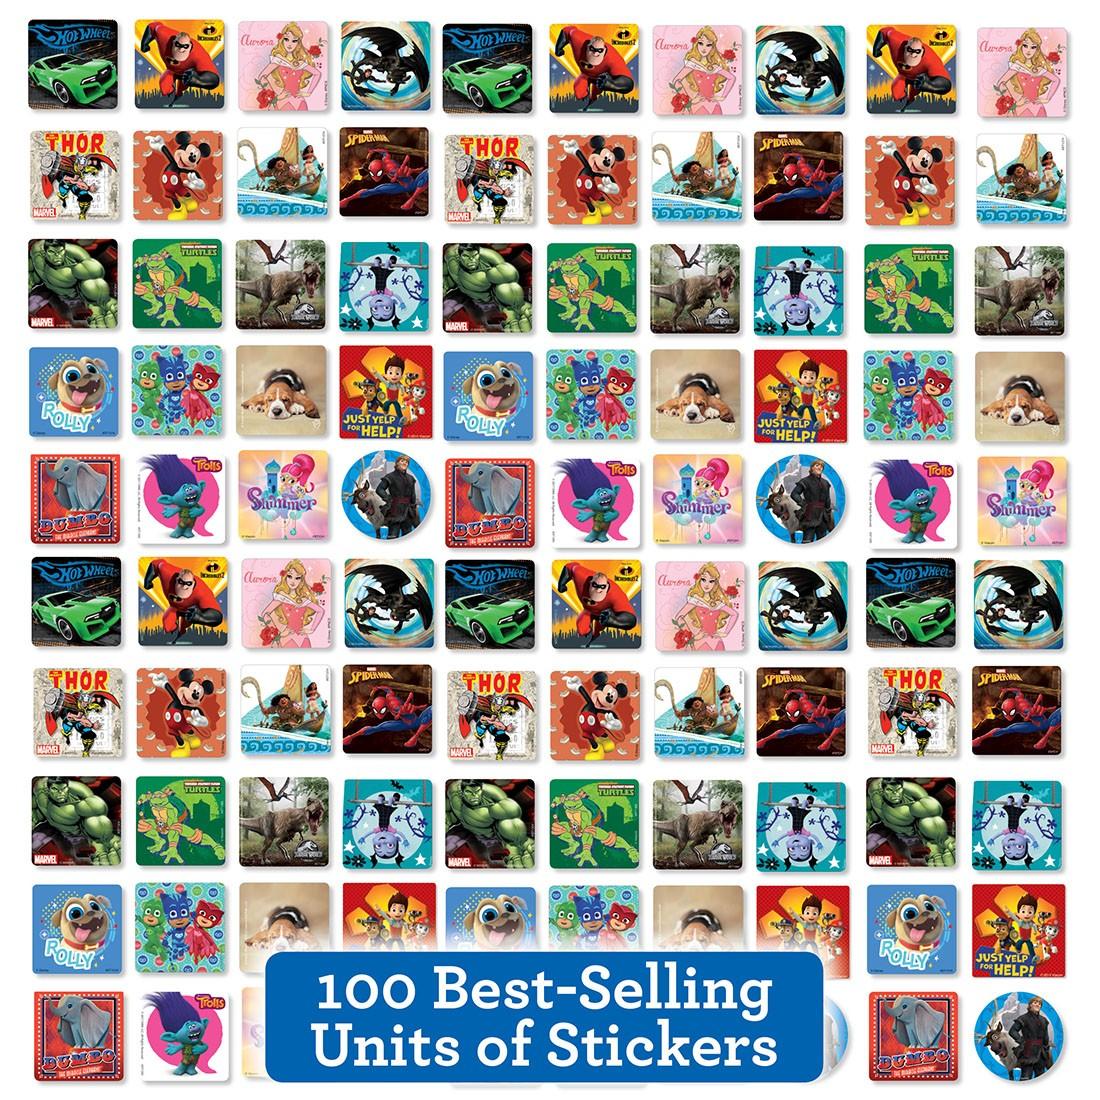 Best of the Best Sticker Sampler                   [image]